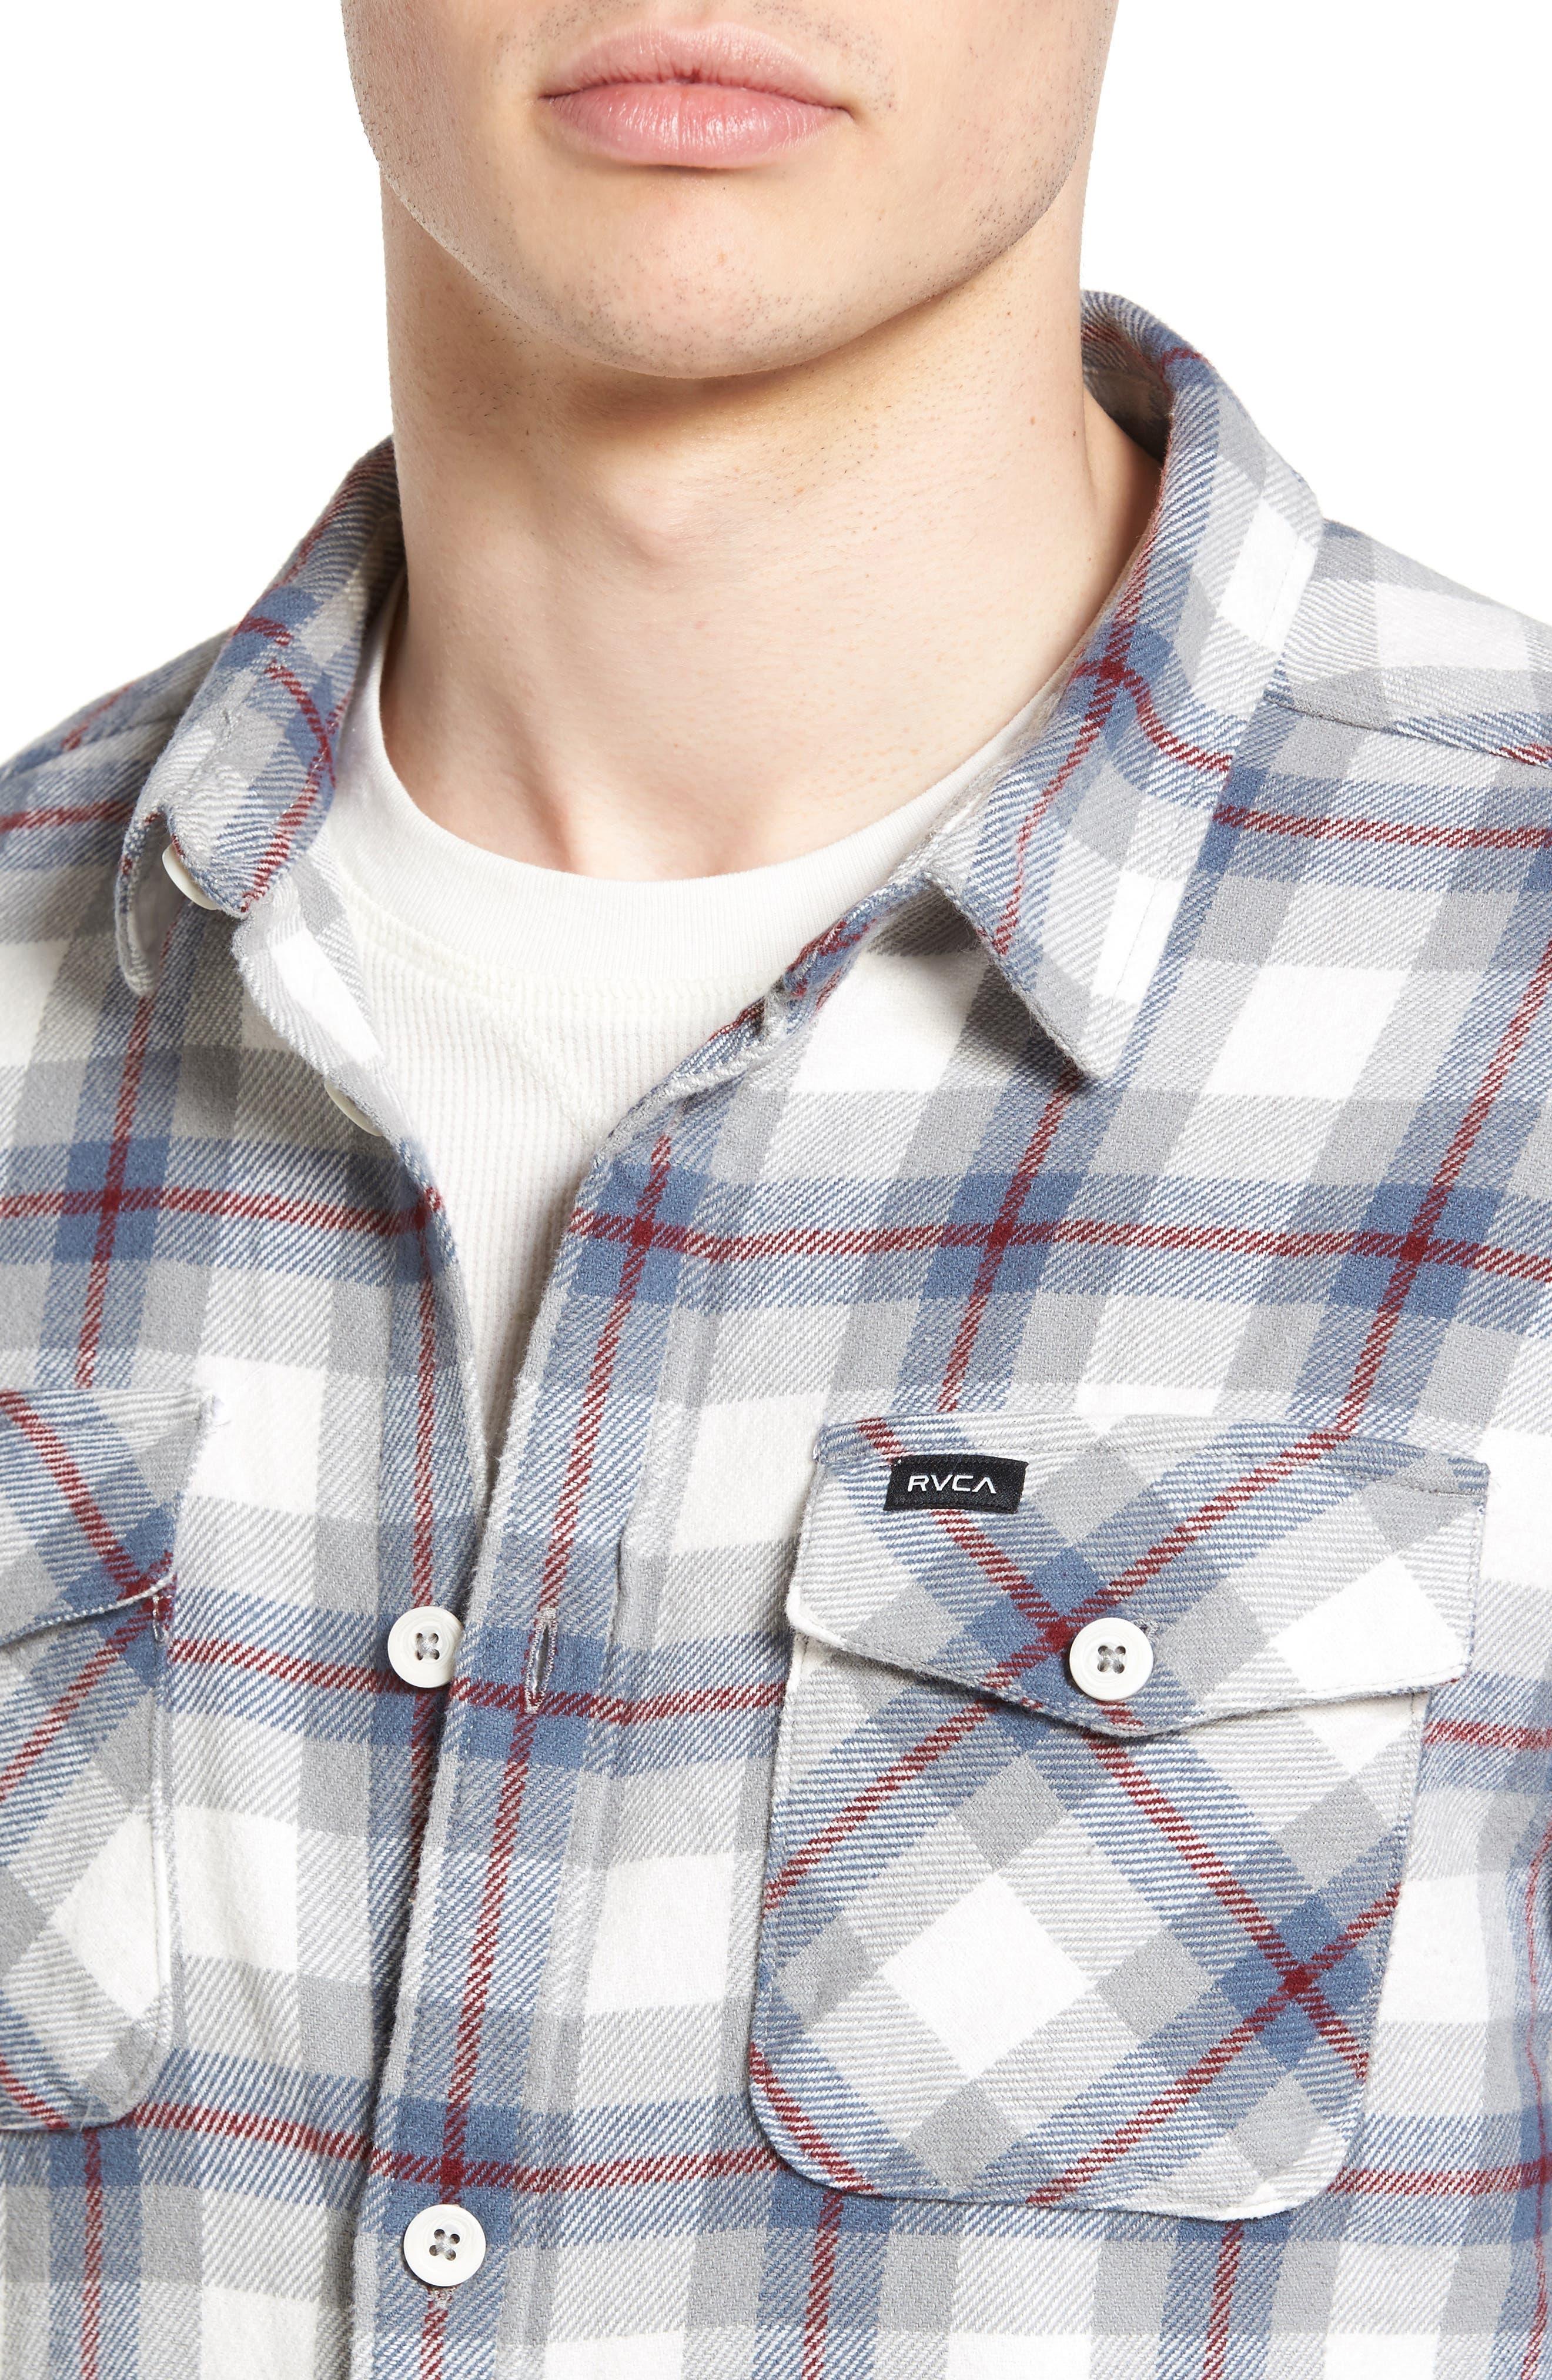 'That'll Work' Trim Fit Plaid Flannel Shirt,                             Alternate thumbnail 20, color,